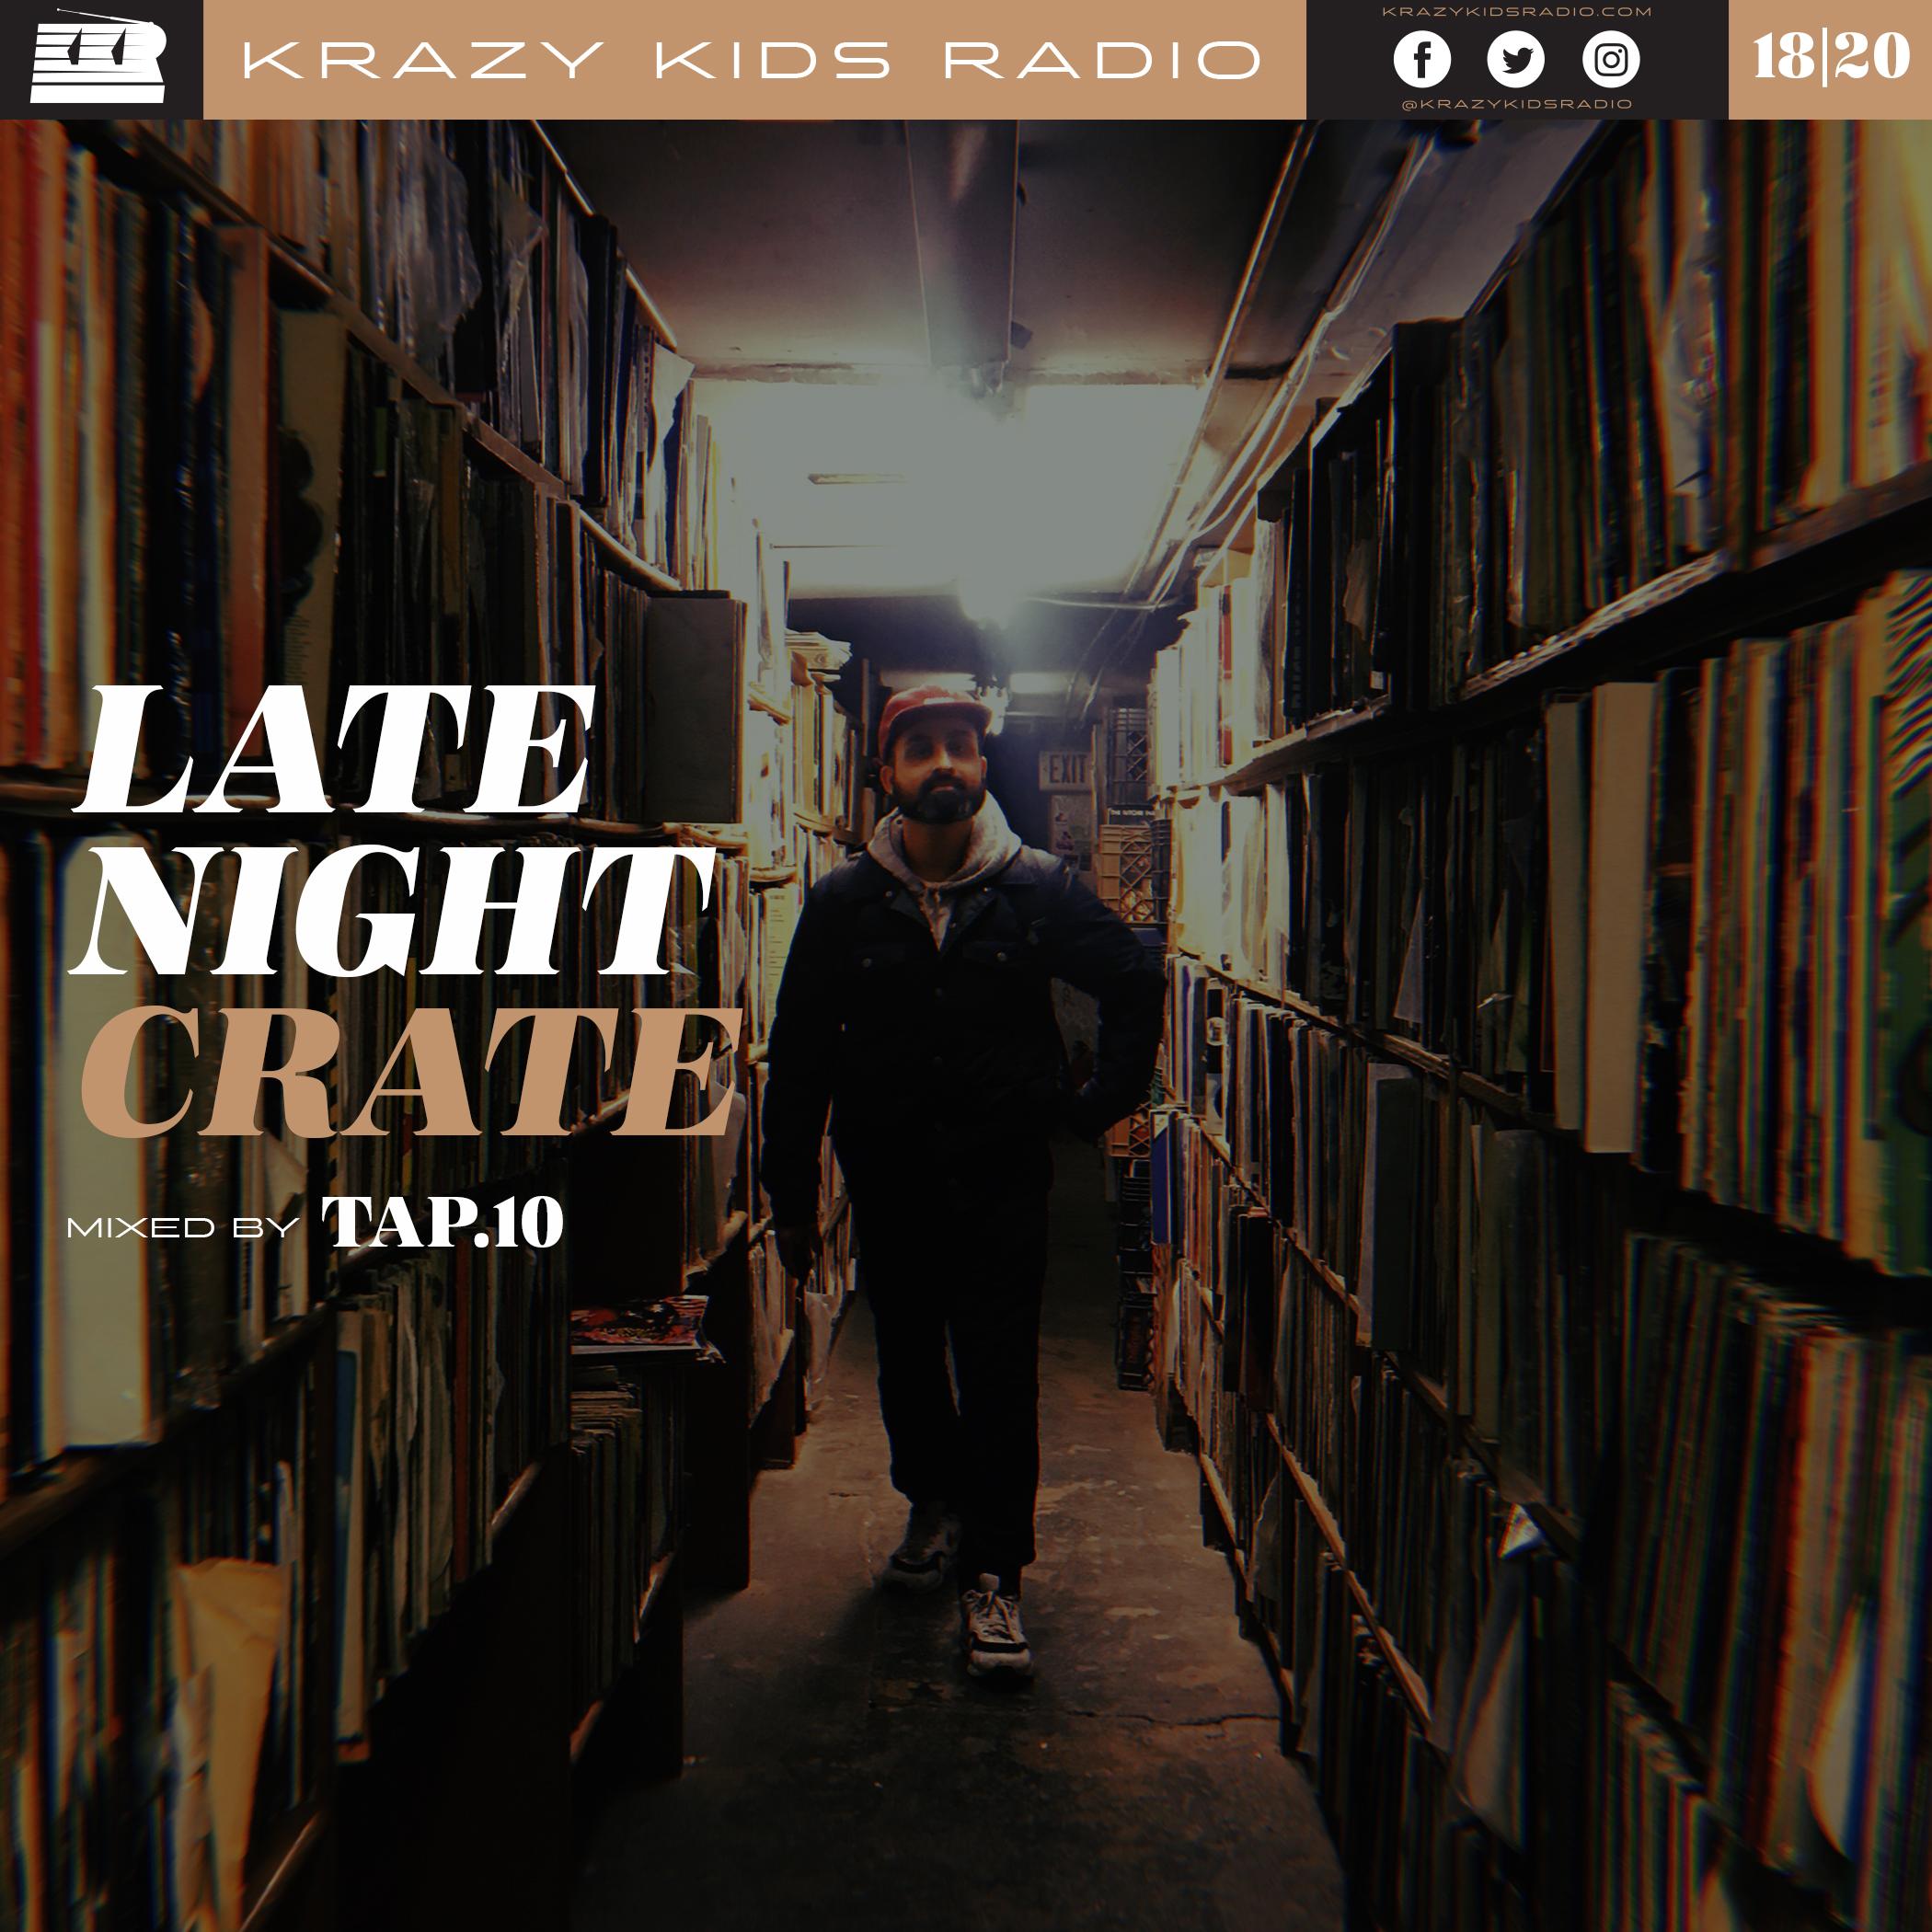 LATE NIGHT CRATE — KRAZY KIDS RADIO